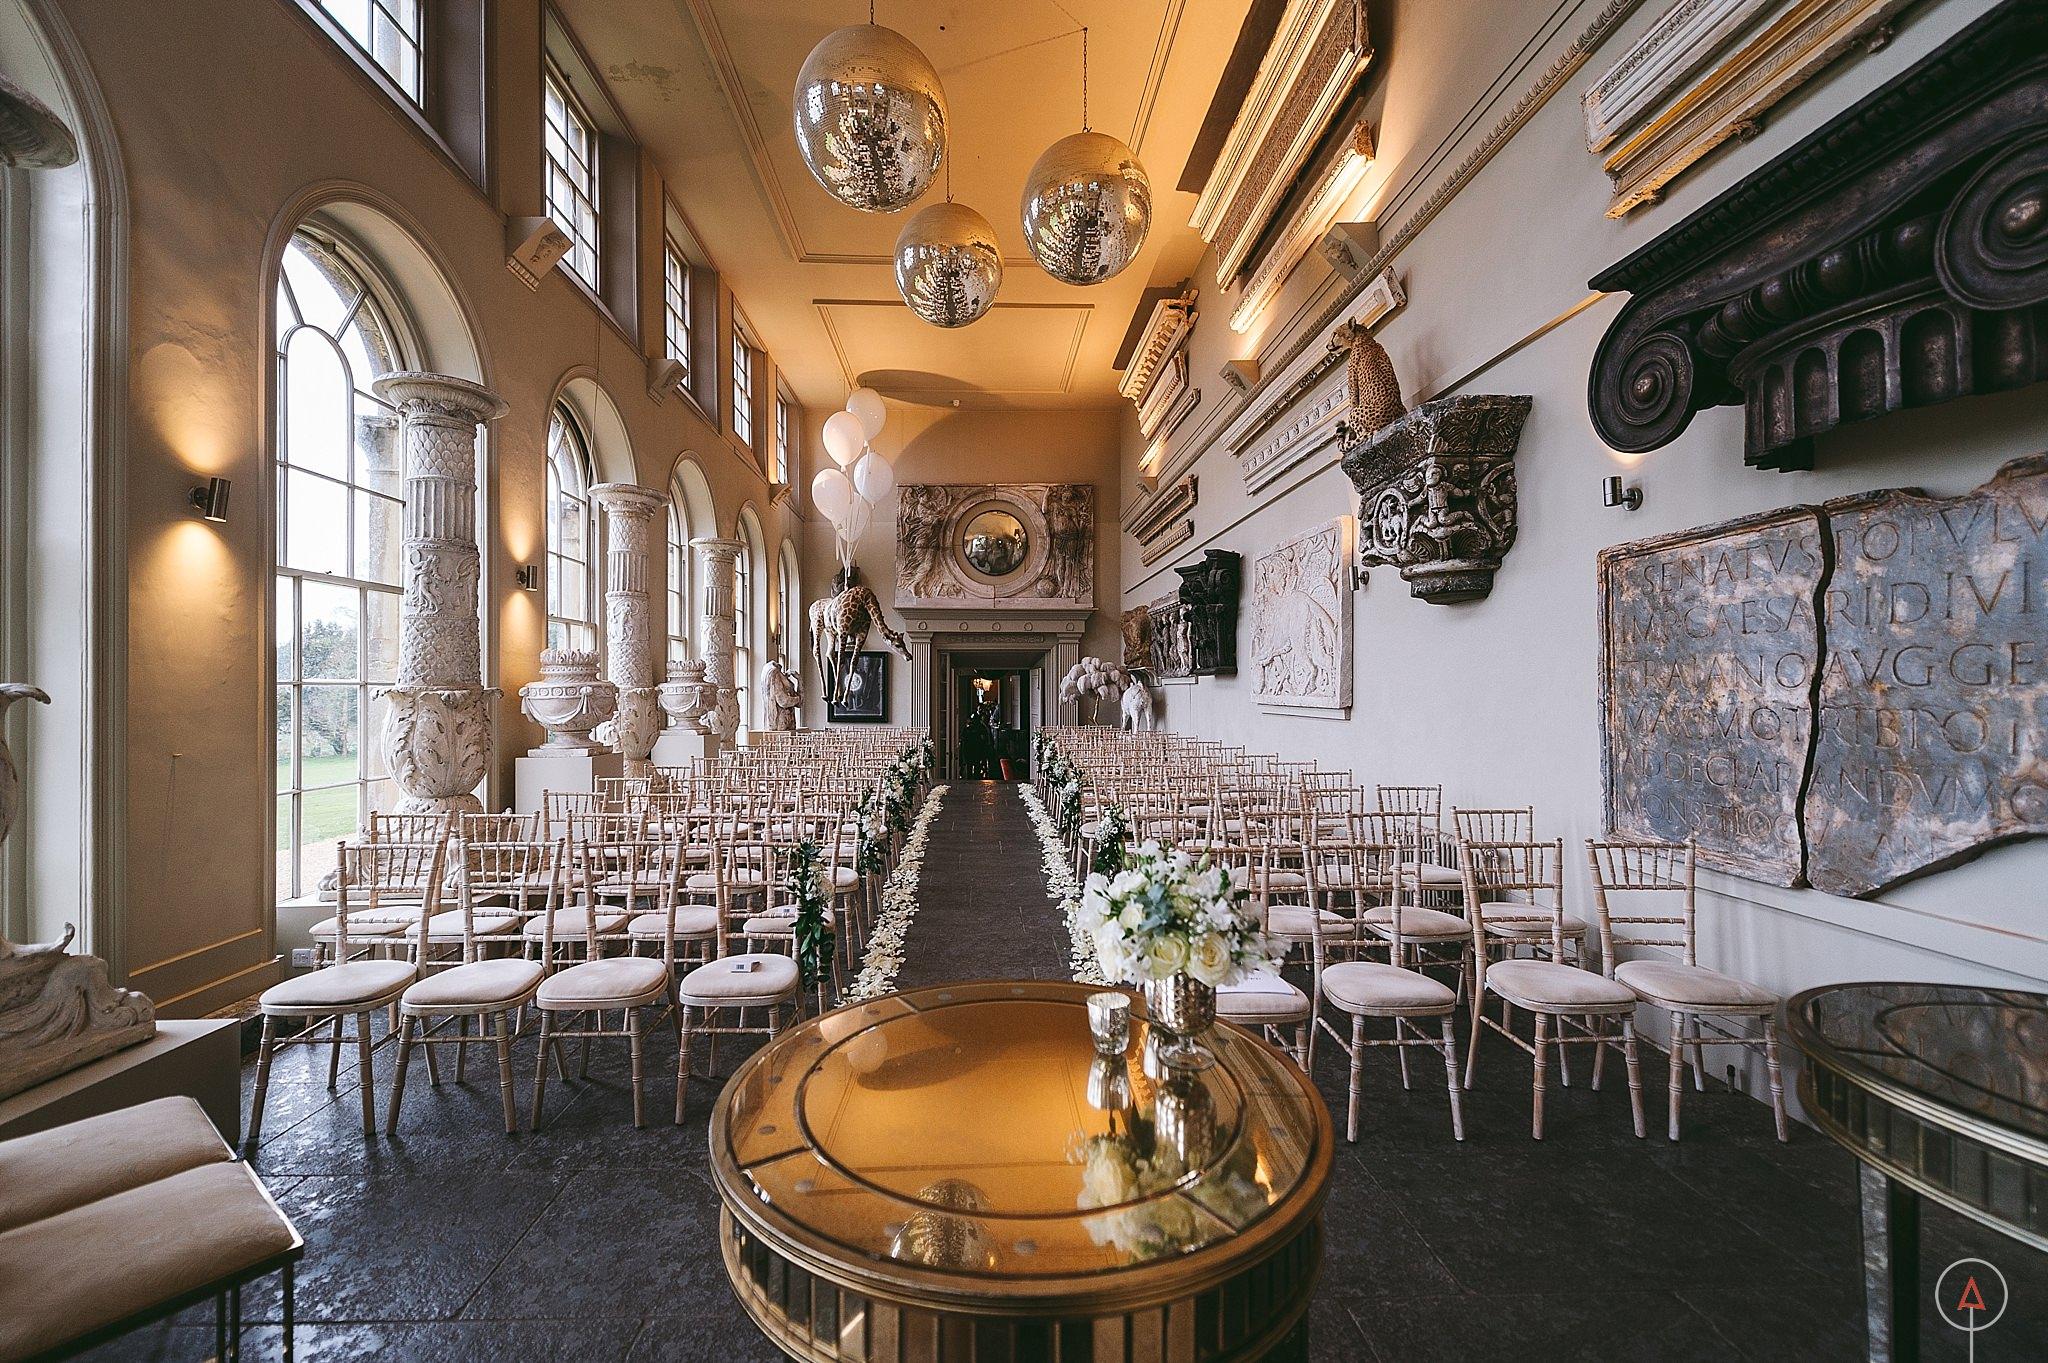 cardiff-wedding-photographer-aga-tomaszek_0202